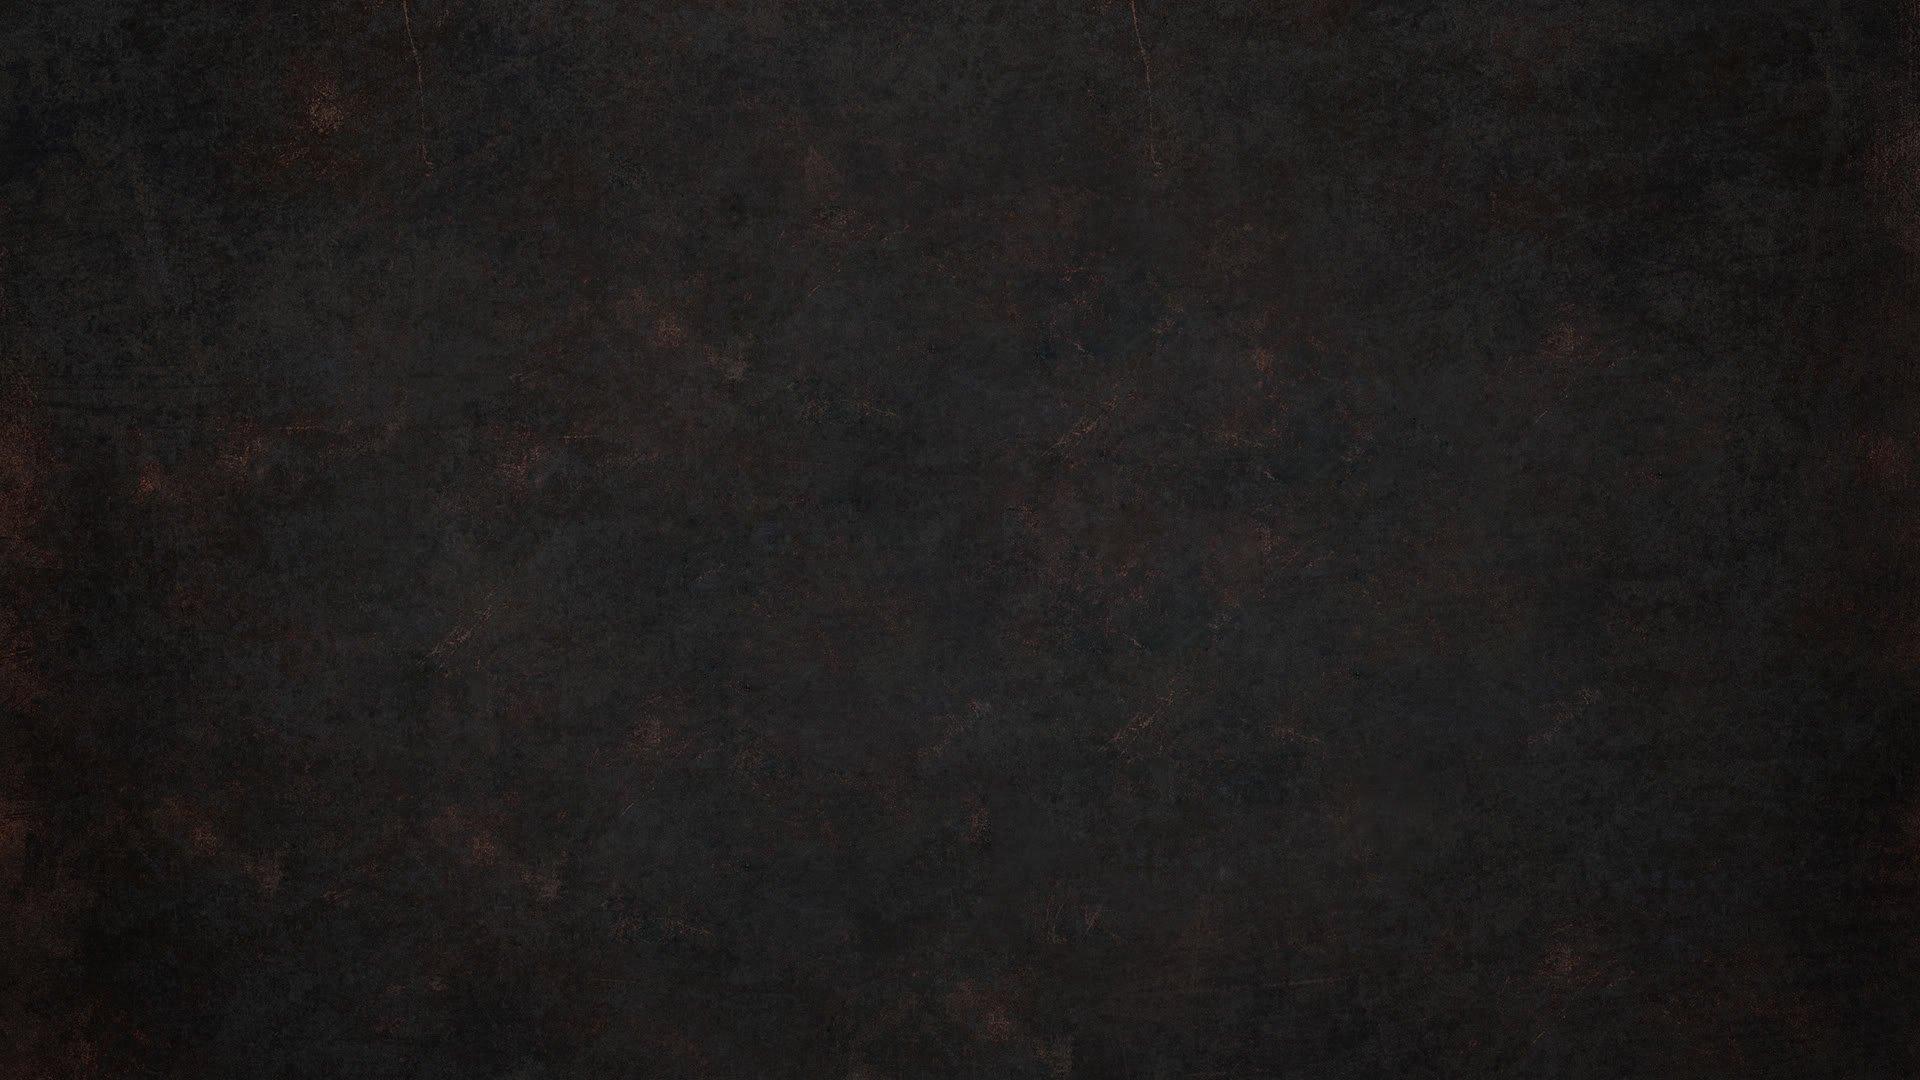 Textures simplistic simple background simple wallpaper | 1920x1080